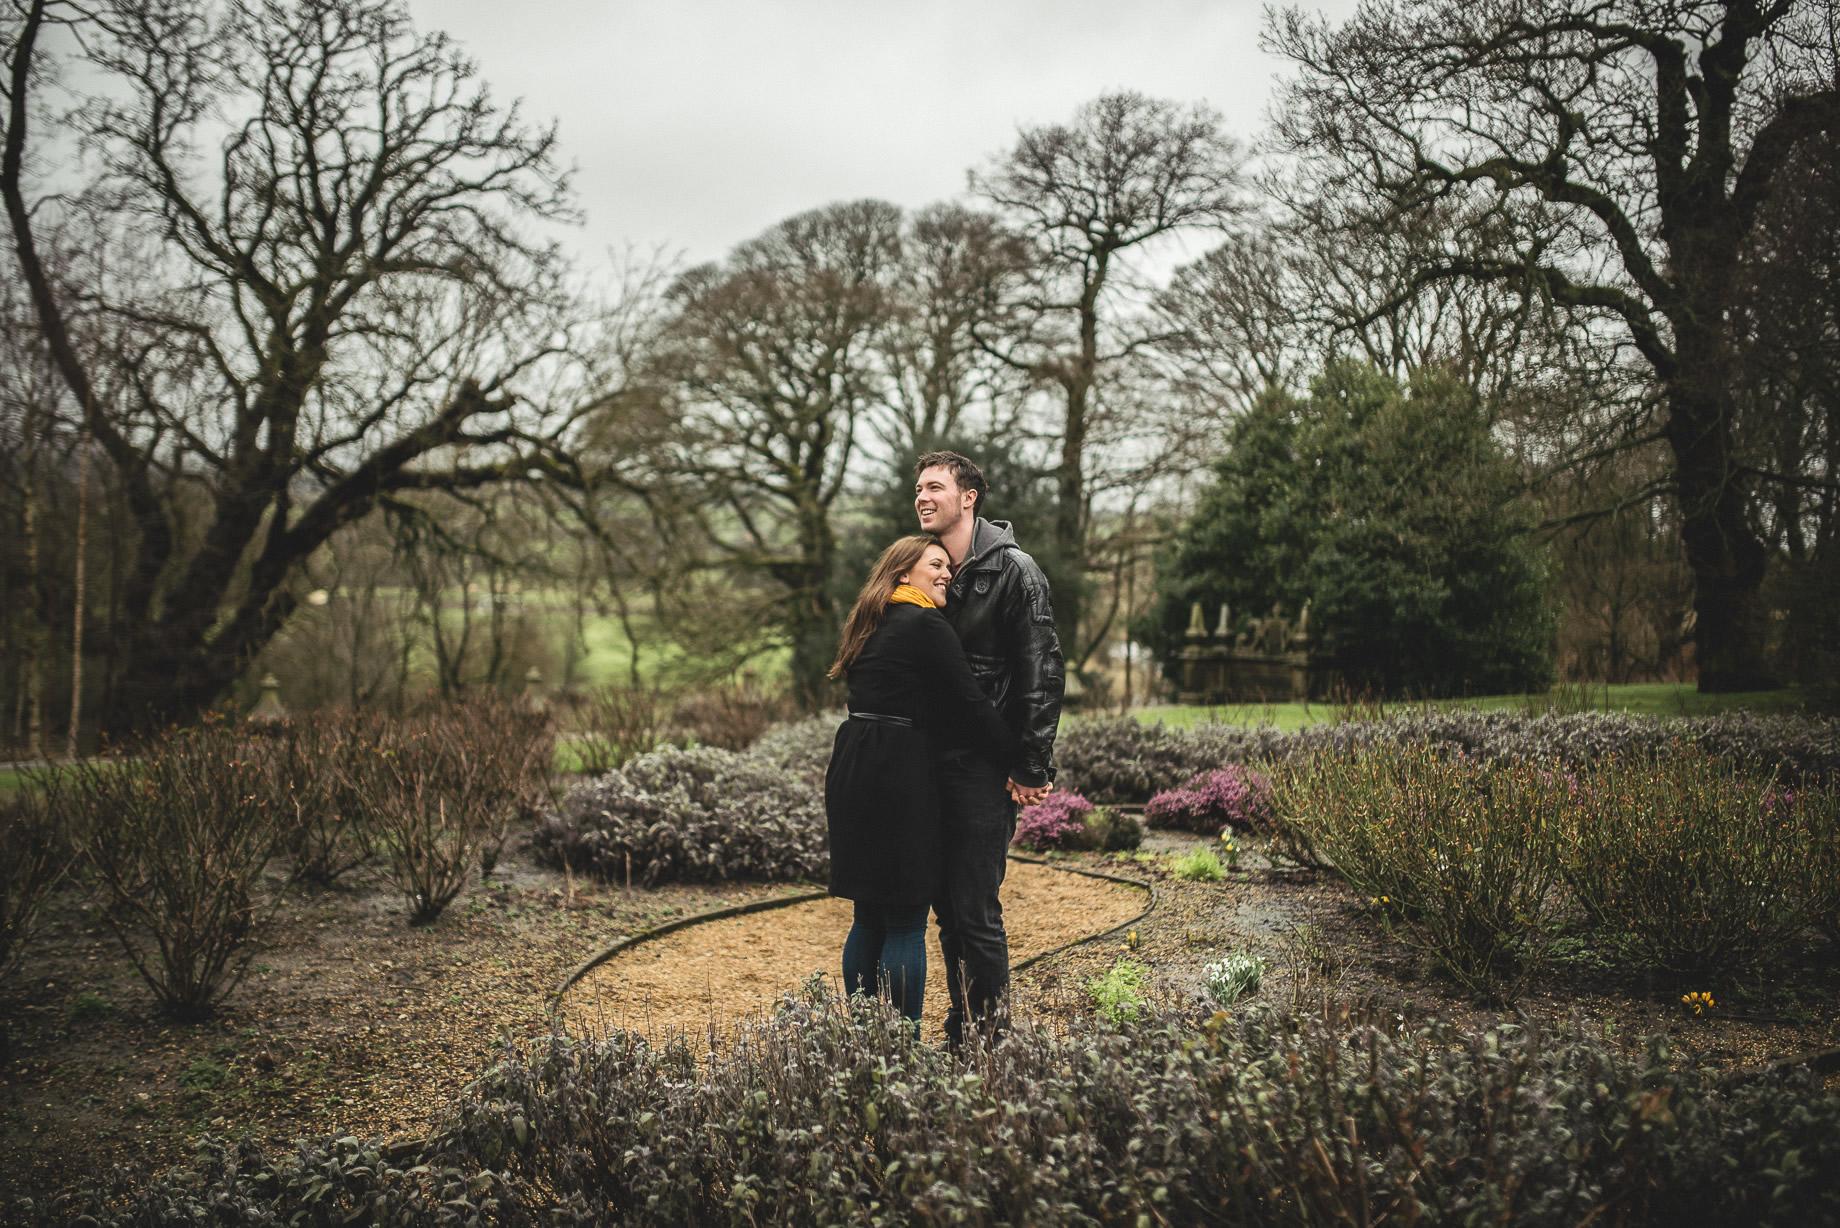 Rachael and Gareth Portrait Shoot at Gawthorpe Hall 006